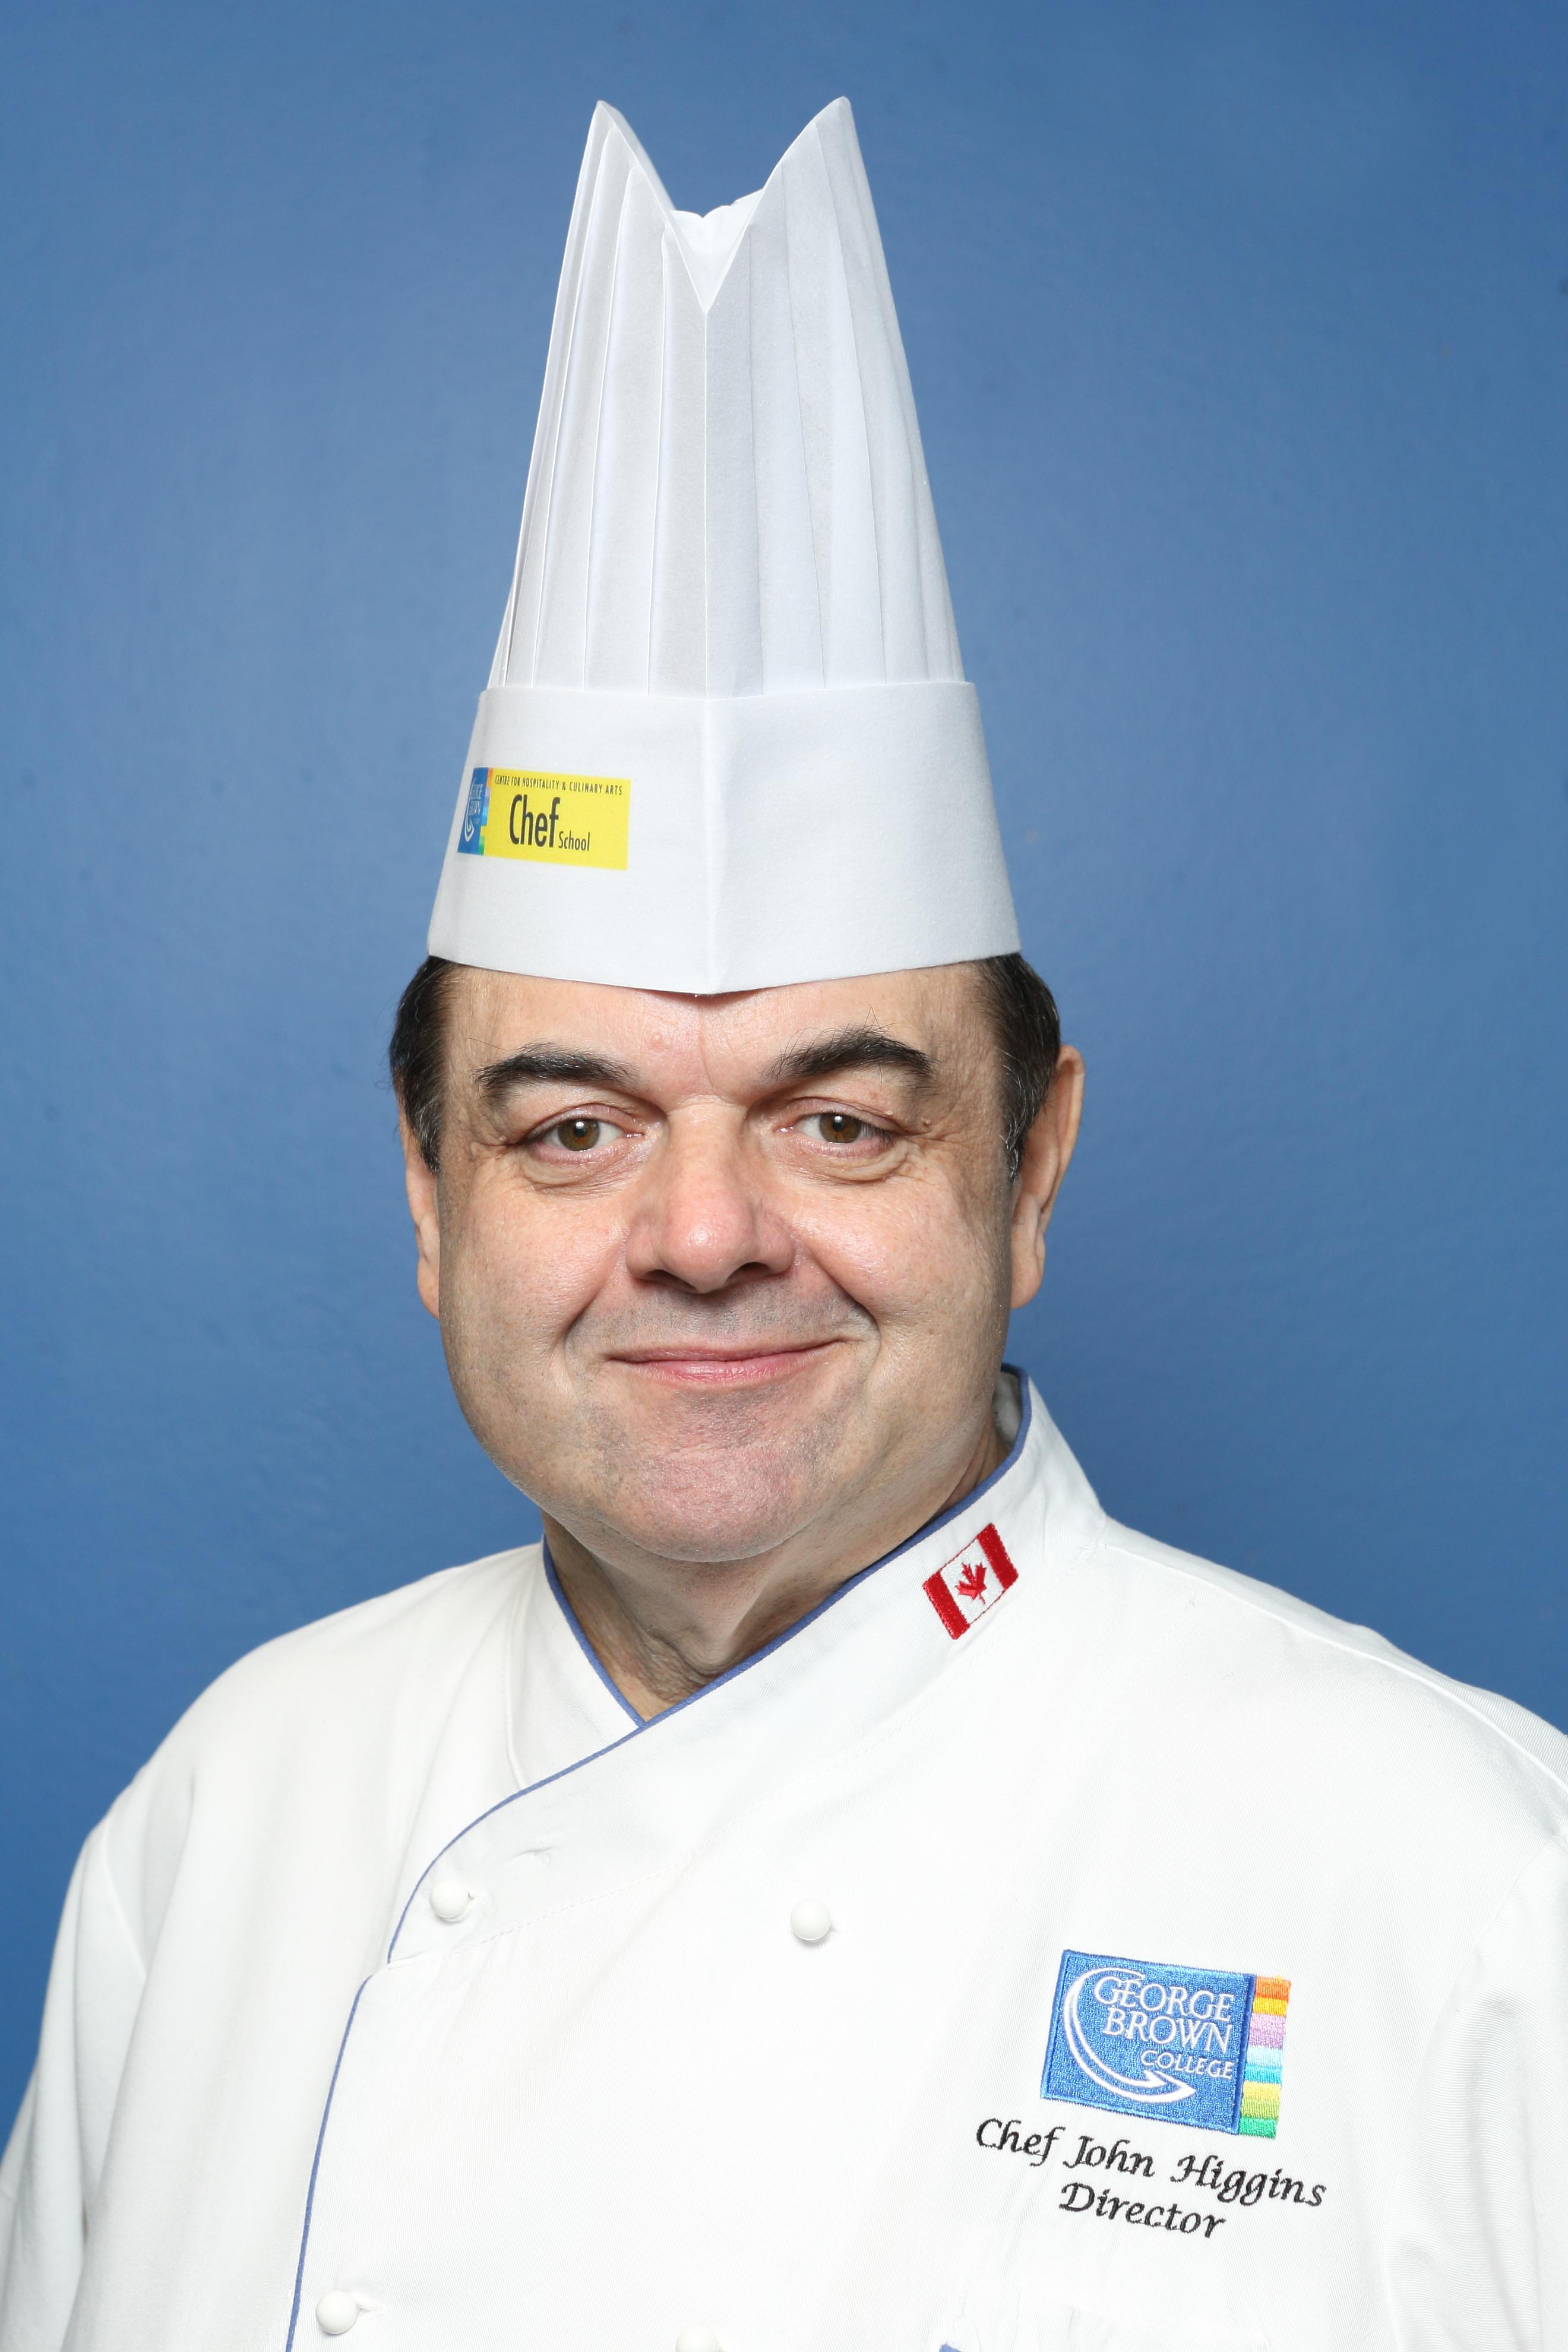 Culinary Workshop with Chef John Higgins